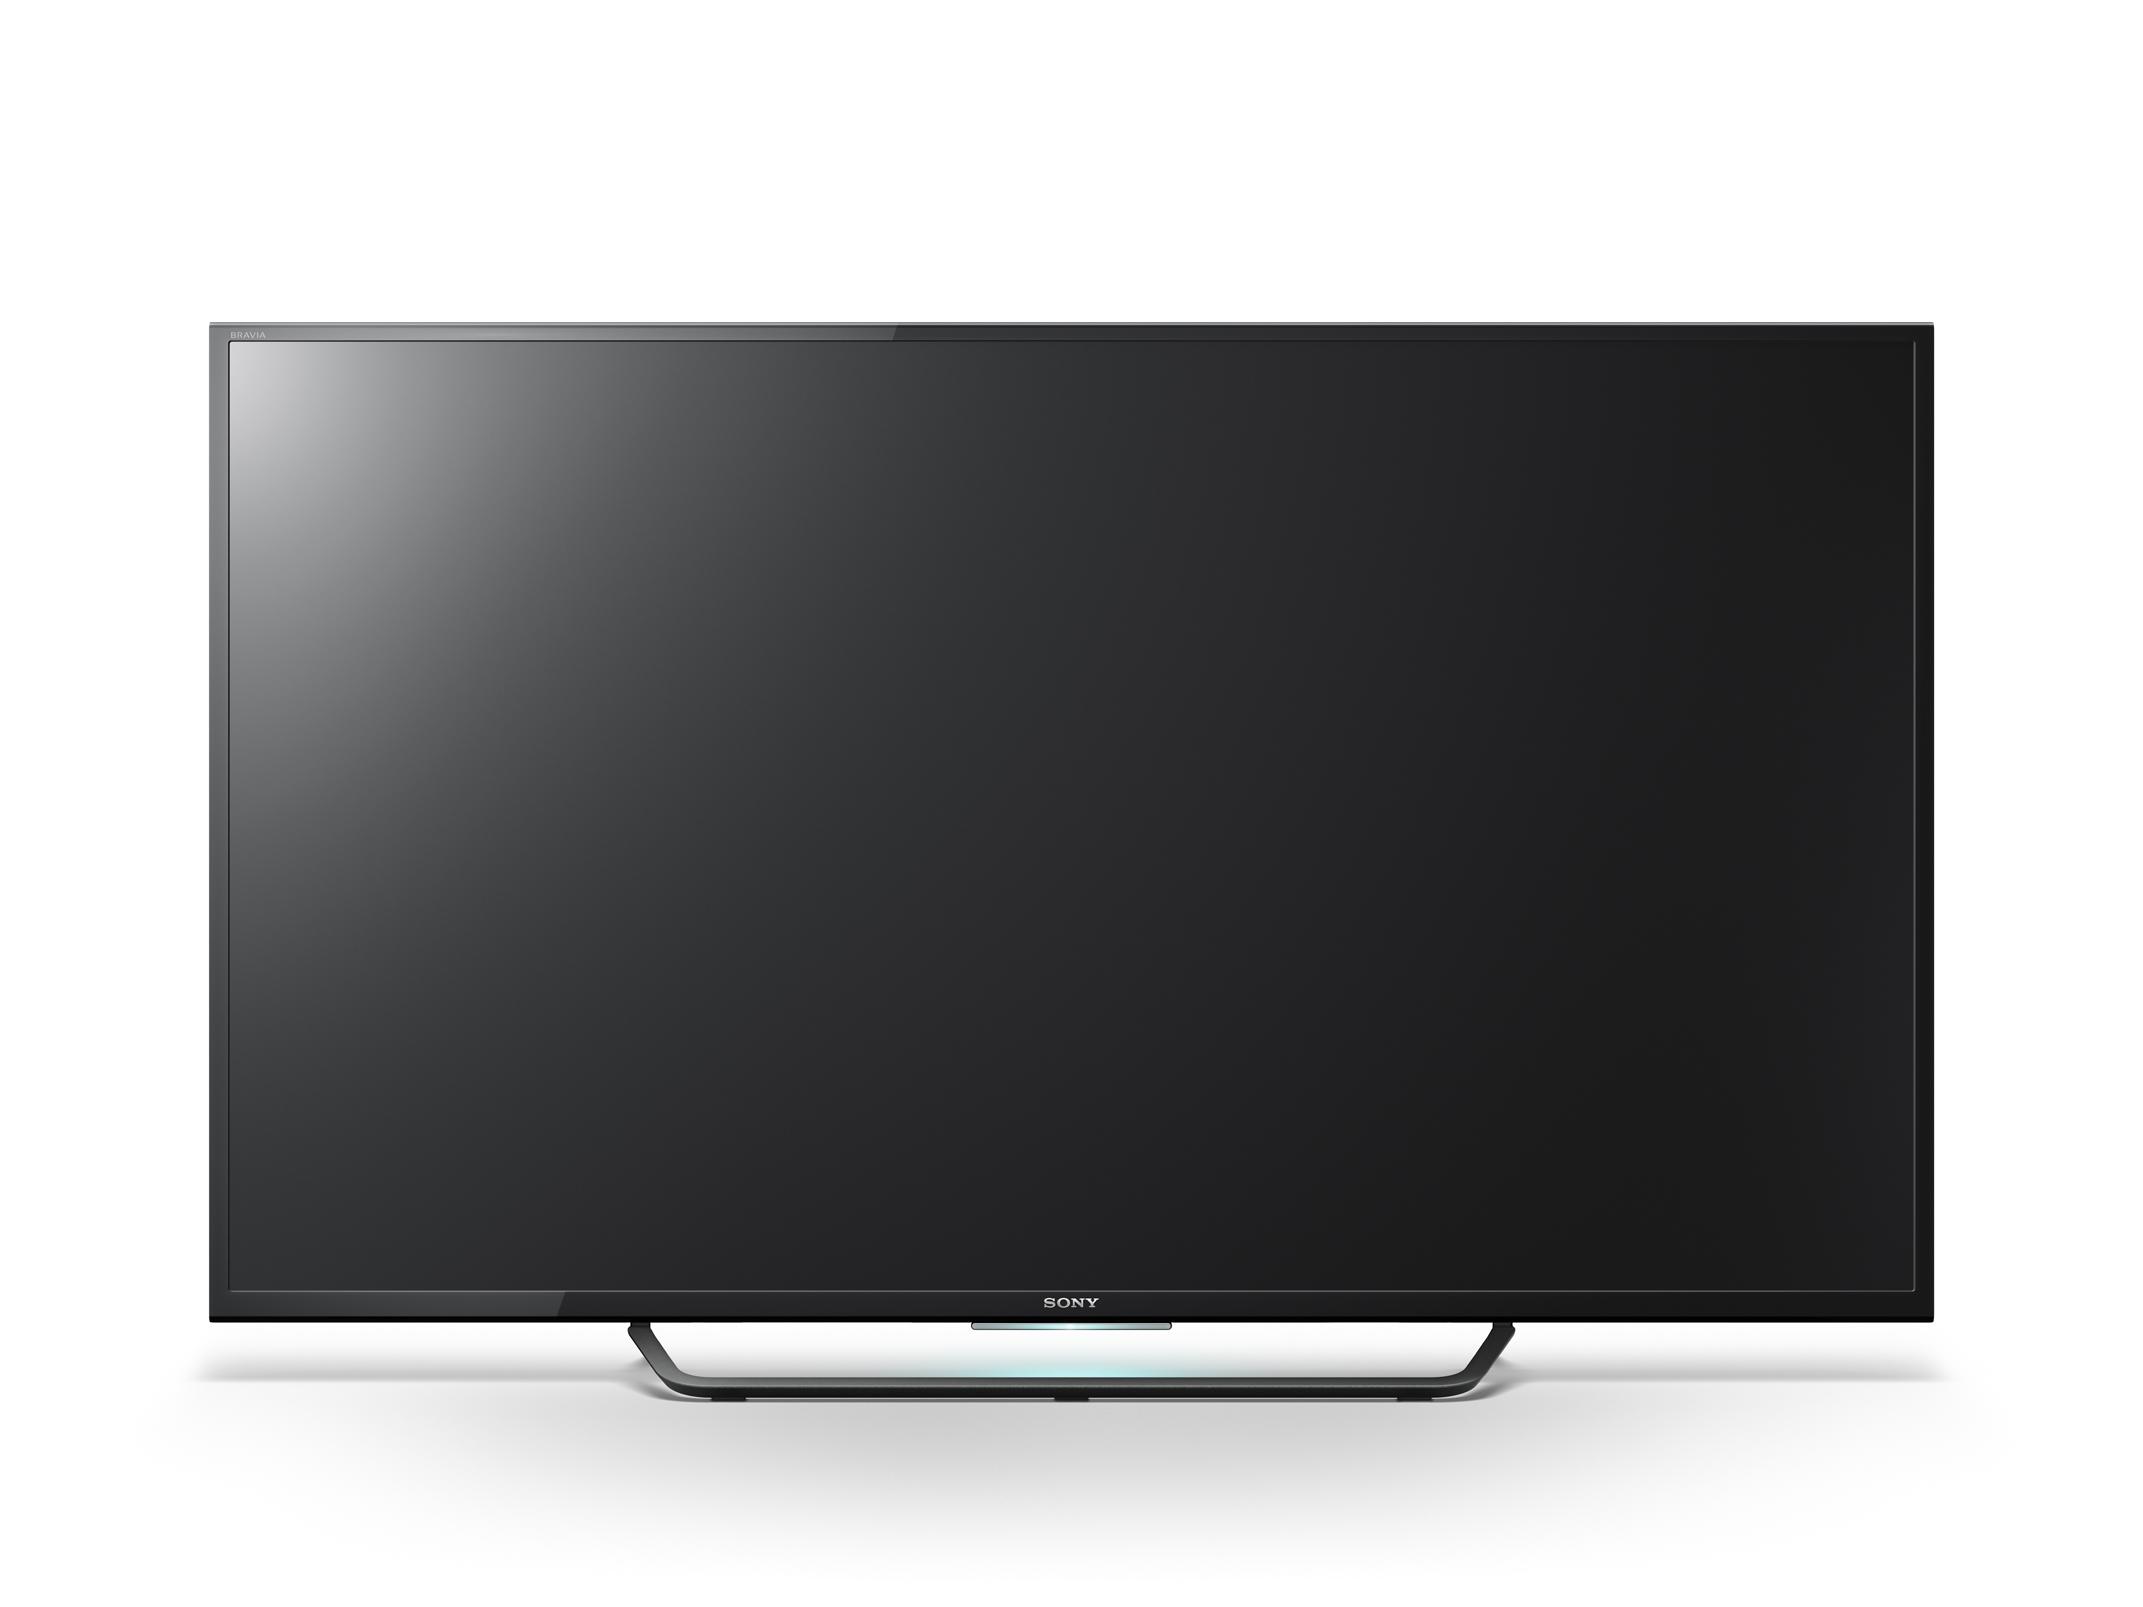 sony bravia xbr x800c series xbr 49x800c 49 led smart tv 4k ultrahd ebay. Black Bedroom Furniture Sets. Home Design Ideas